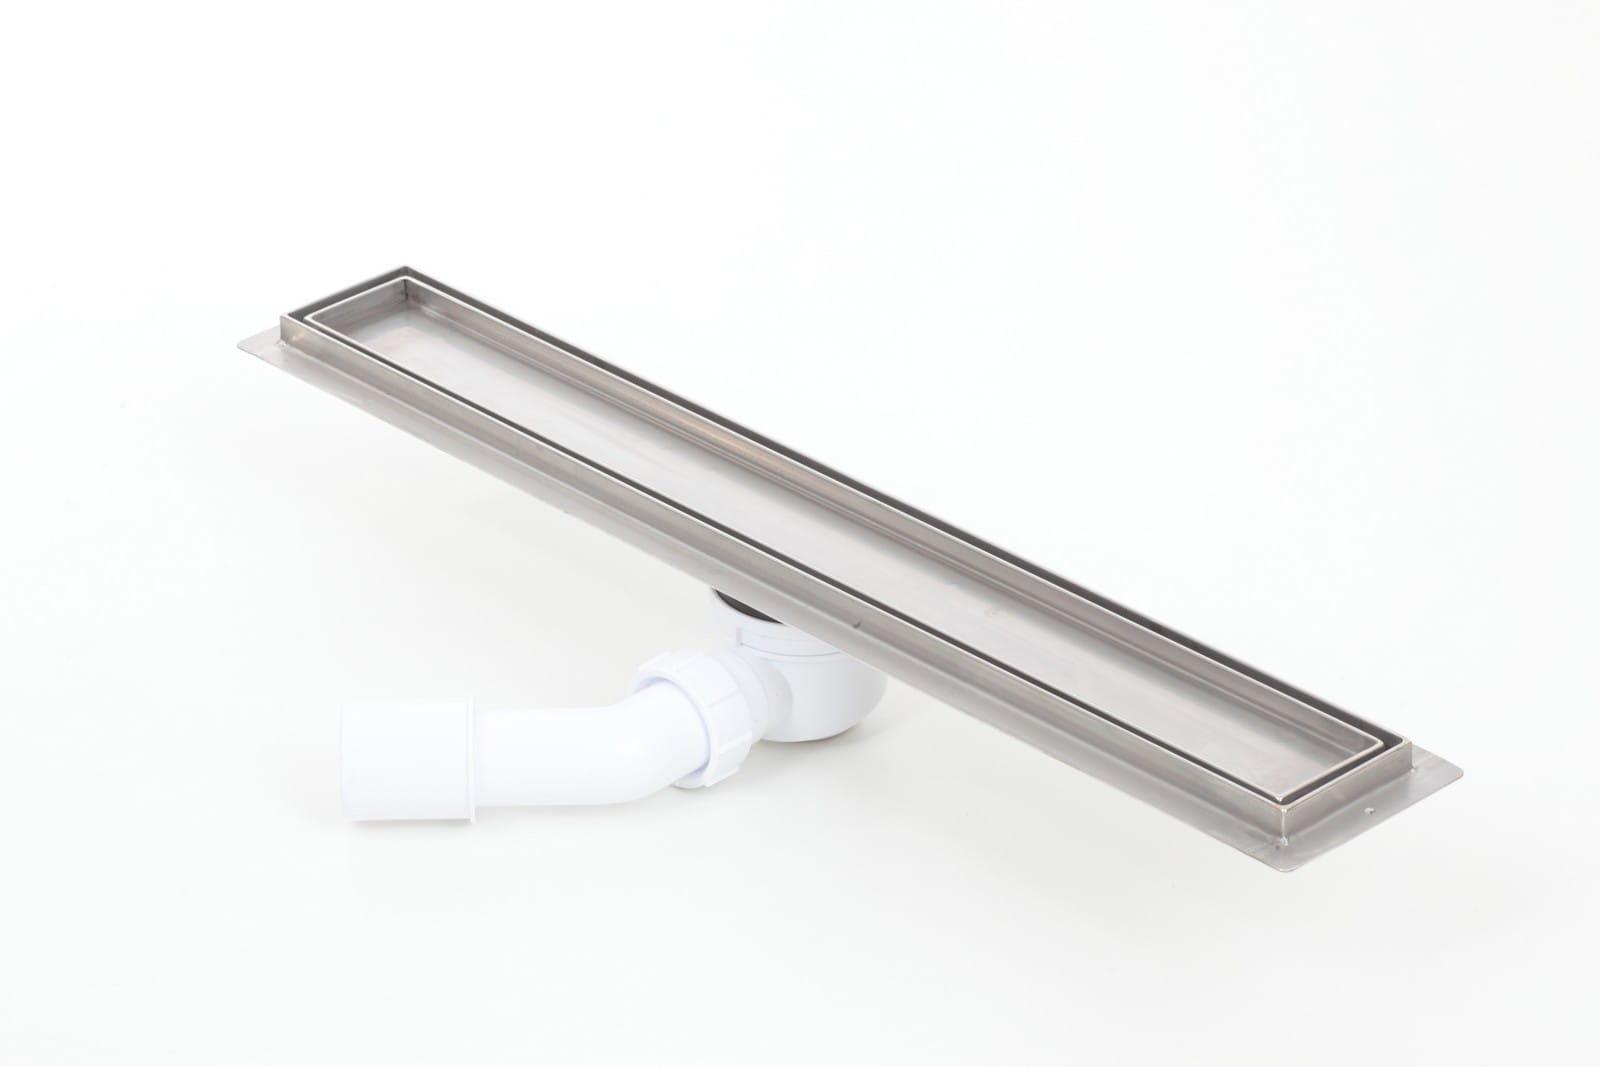 Odpływ liniowy Kesmet Silver Ceramic Tile 700KF_p 70 cm (syfon plastik)